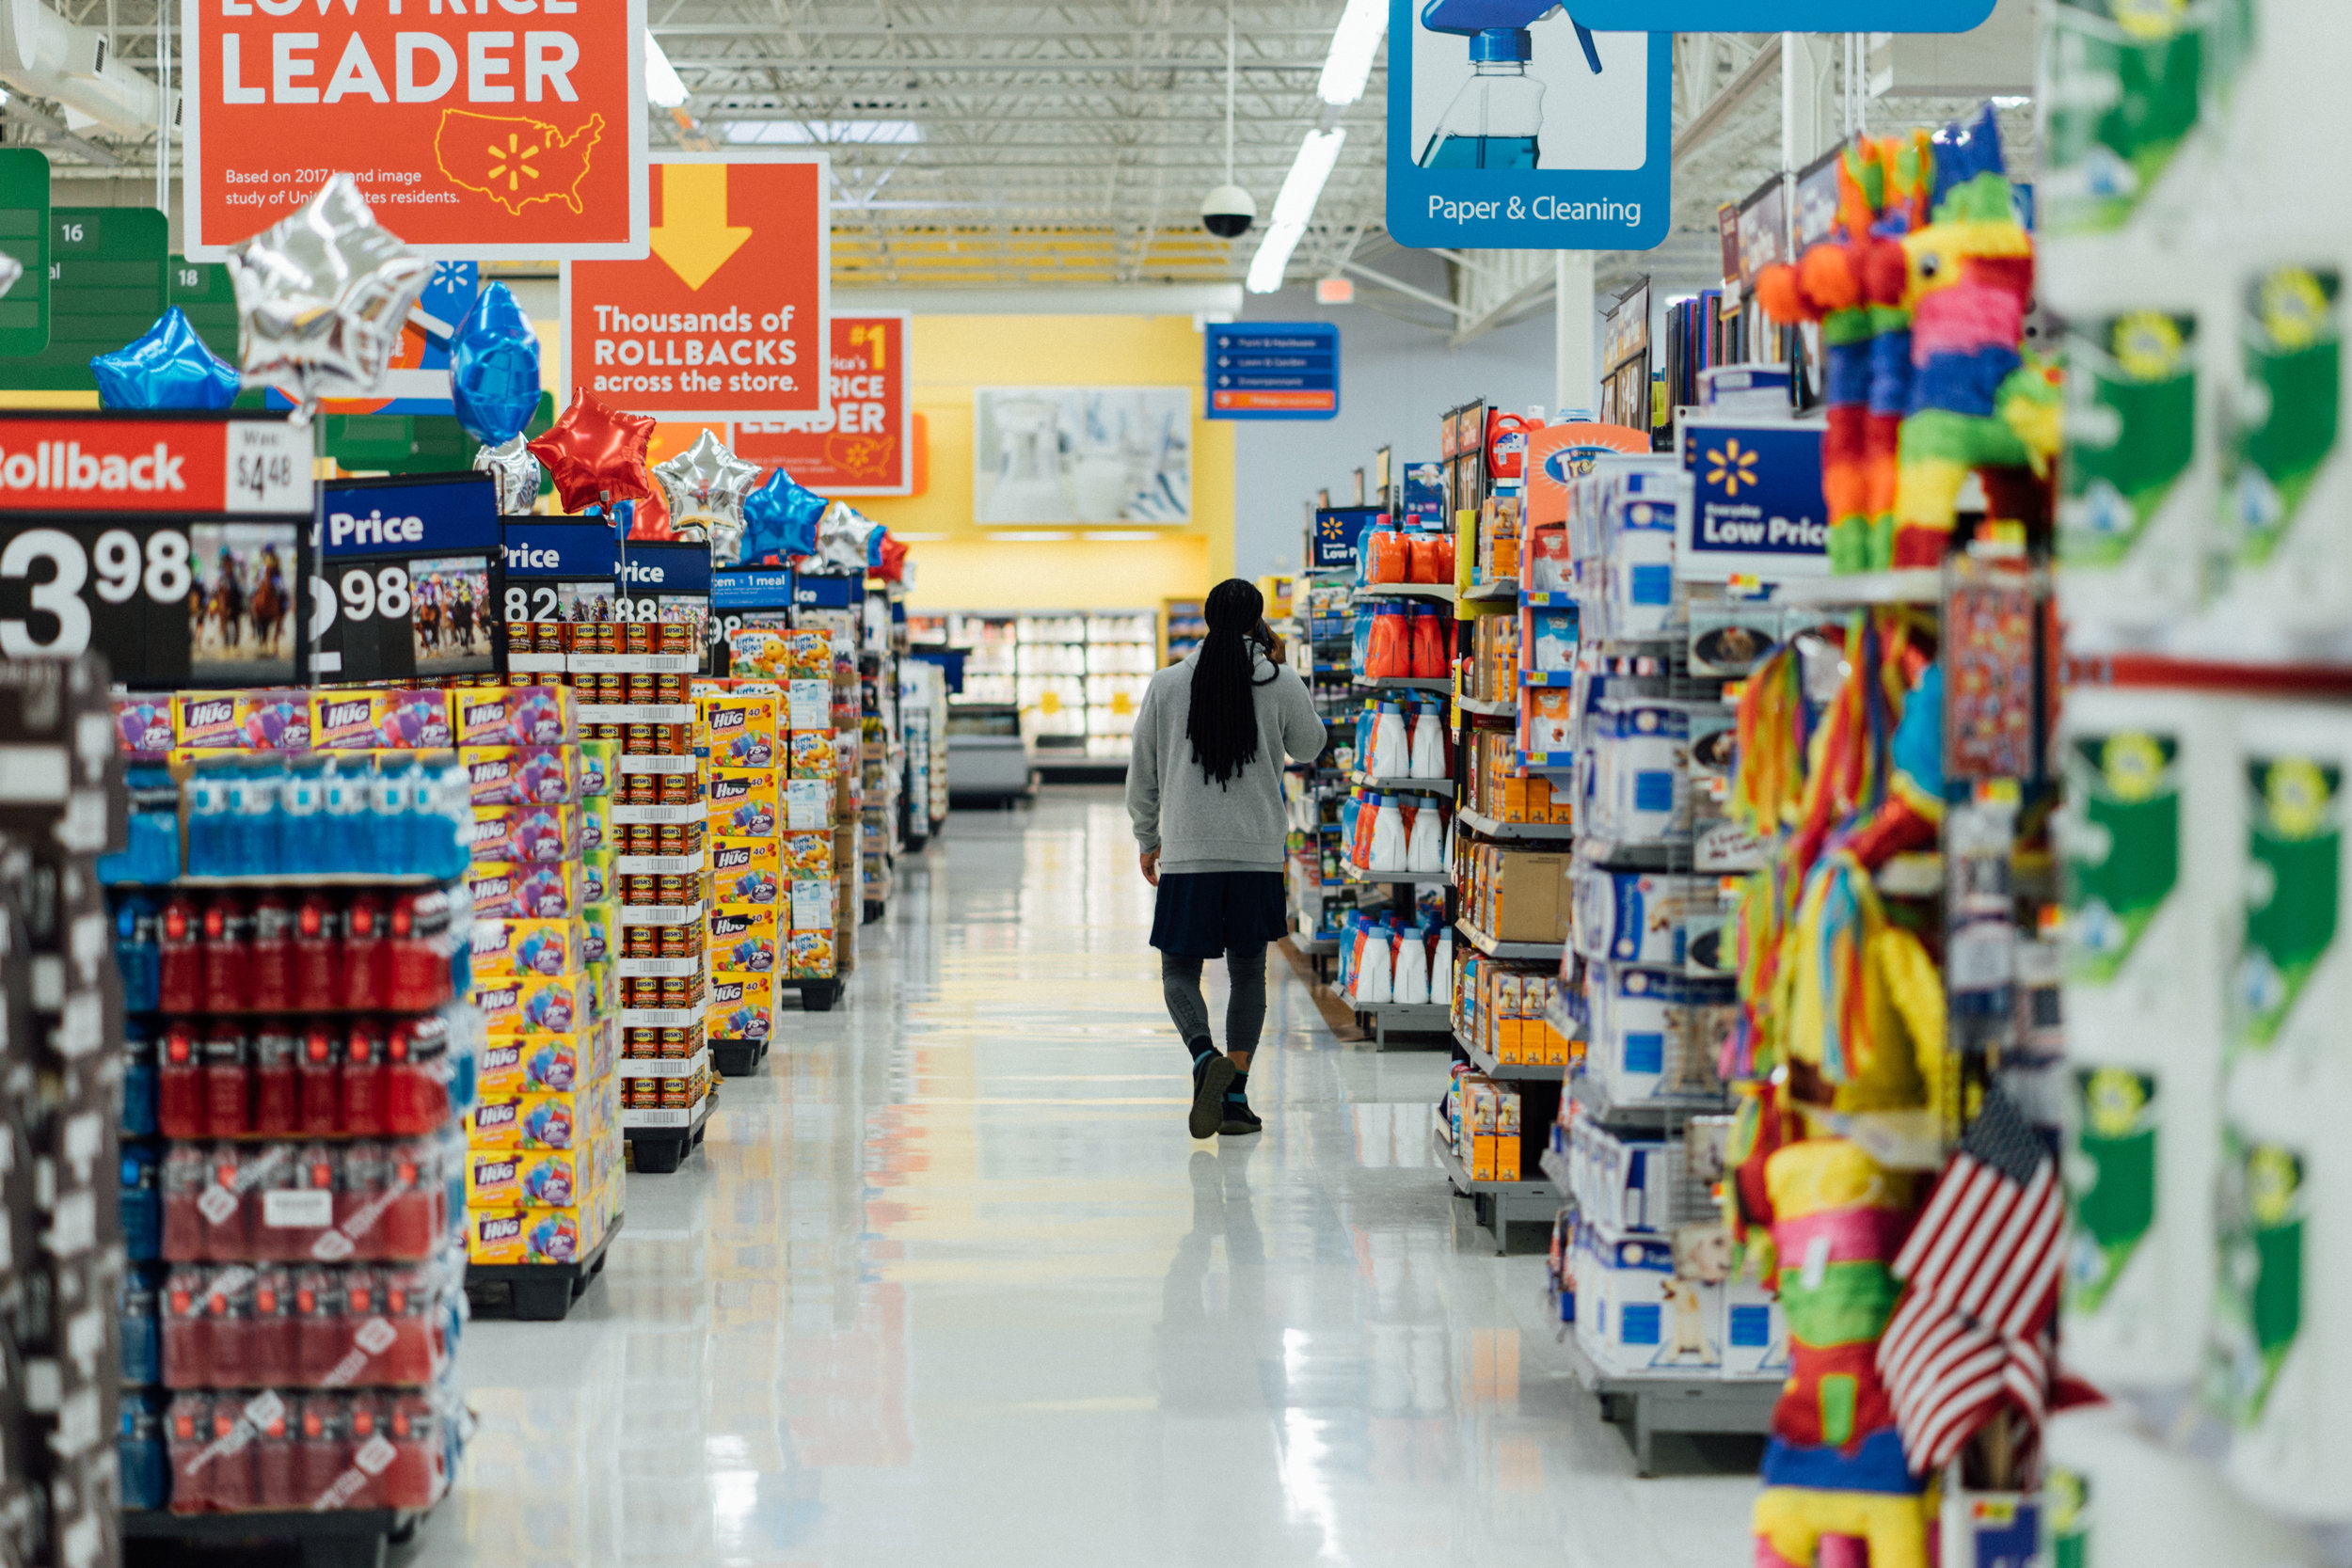 AI Model For Retail Shelf Monitoring